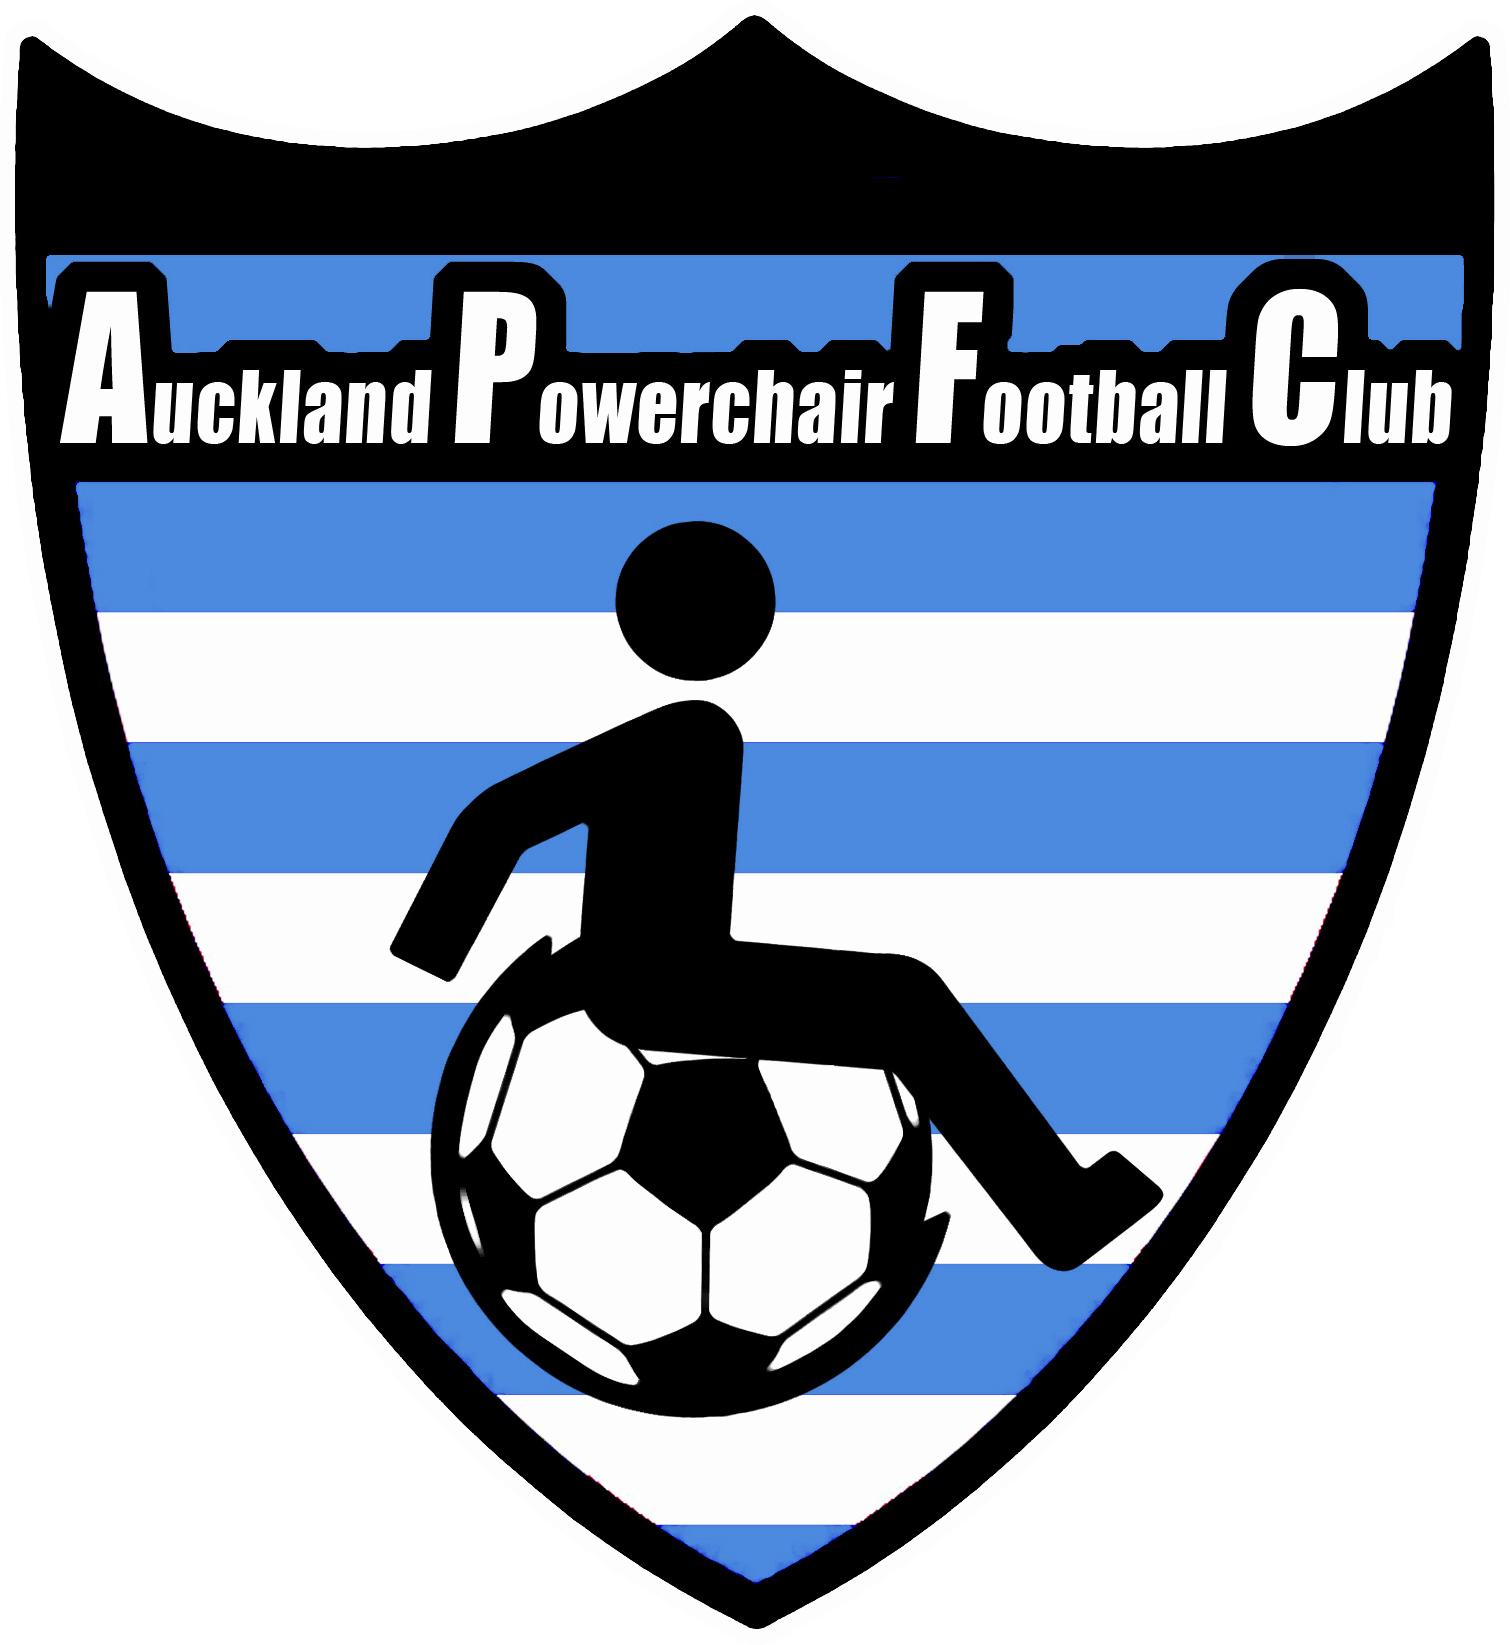 Football Border for Word Elegant Rules – Auckland Powerchair Football Club Incorporated